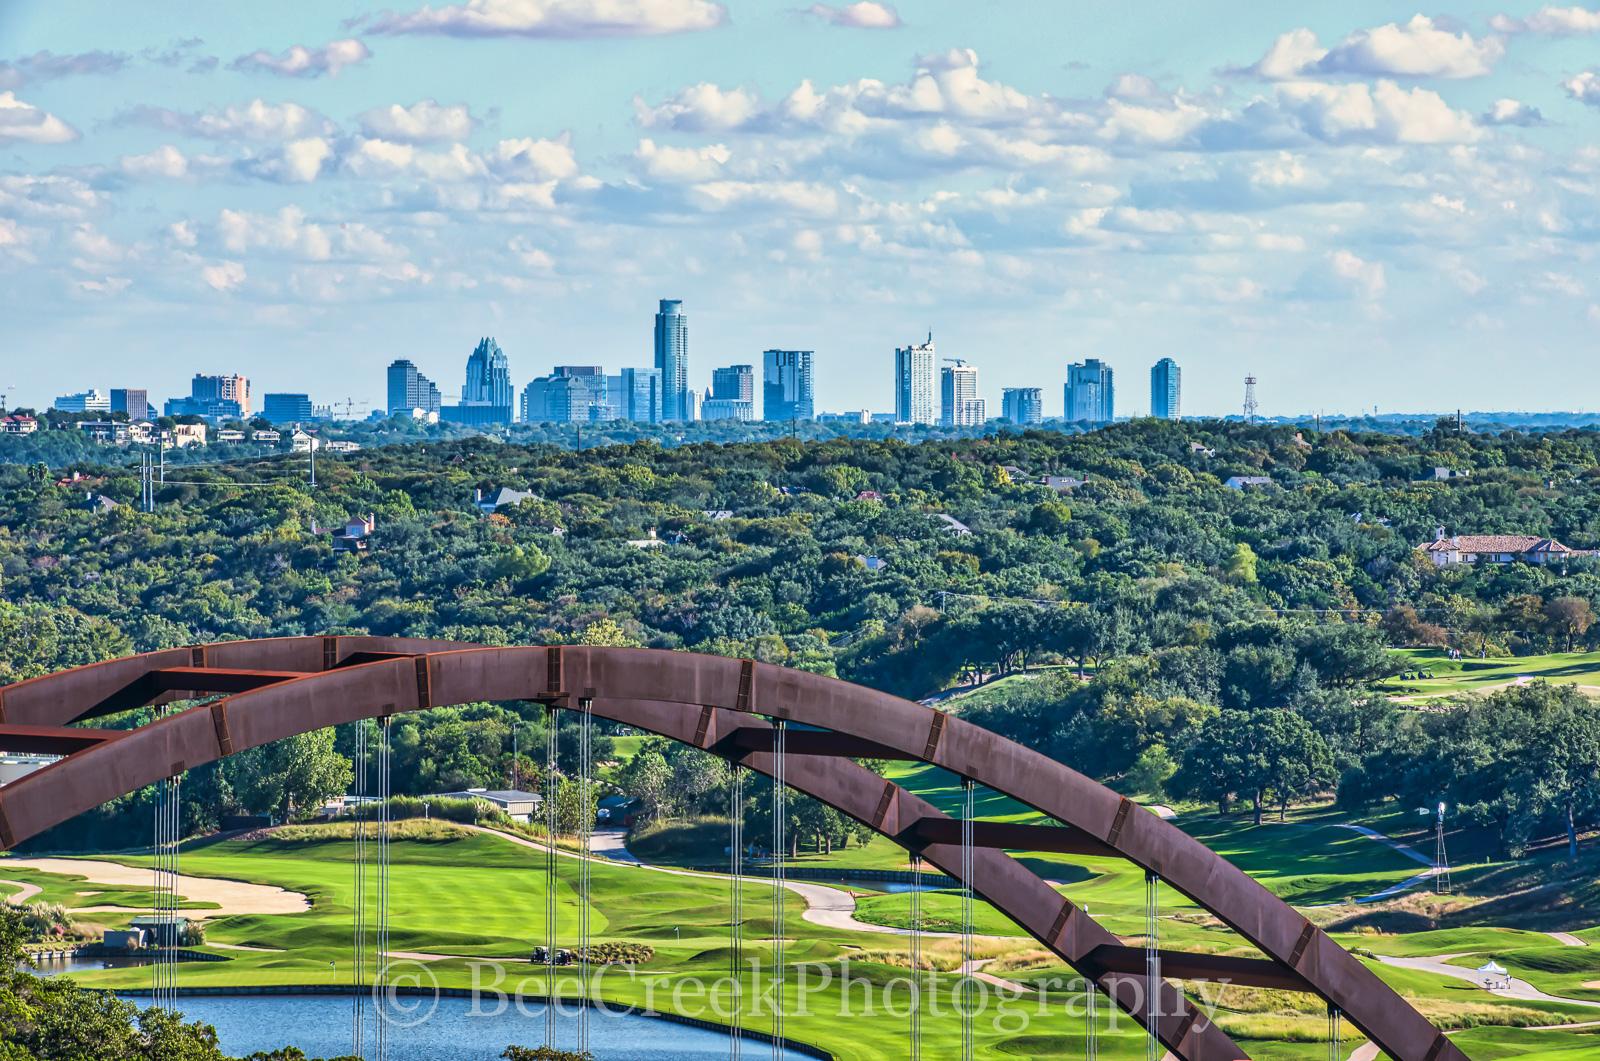 360 bridge, Austin, Austin Country Club, Pennybacker bridge, cities, city, cityscape, downtown, golf course, modern, skyline, urba, , photo